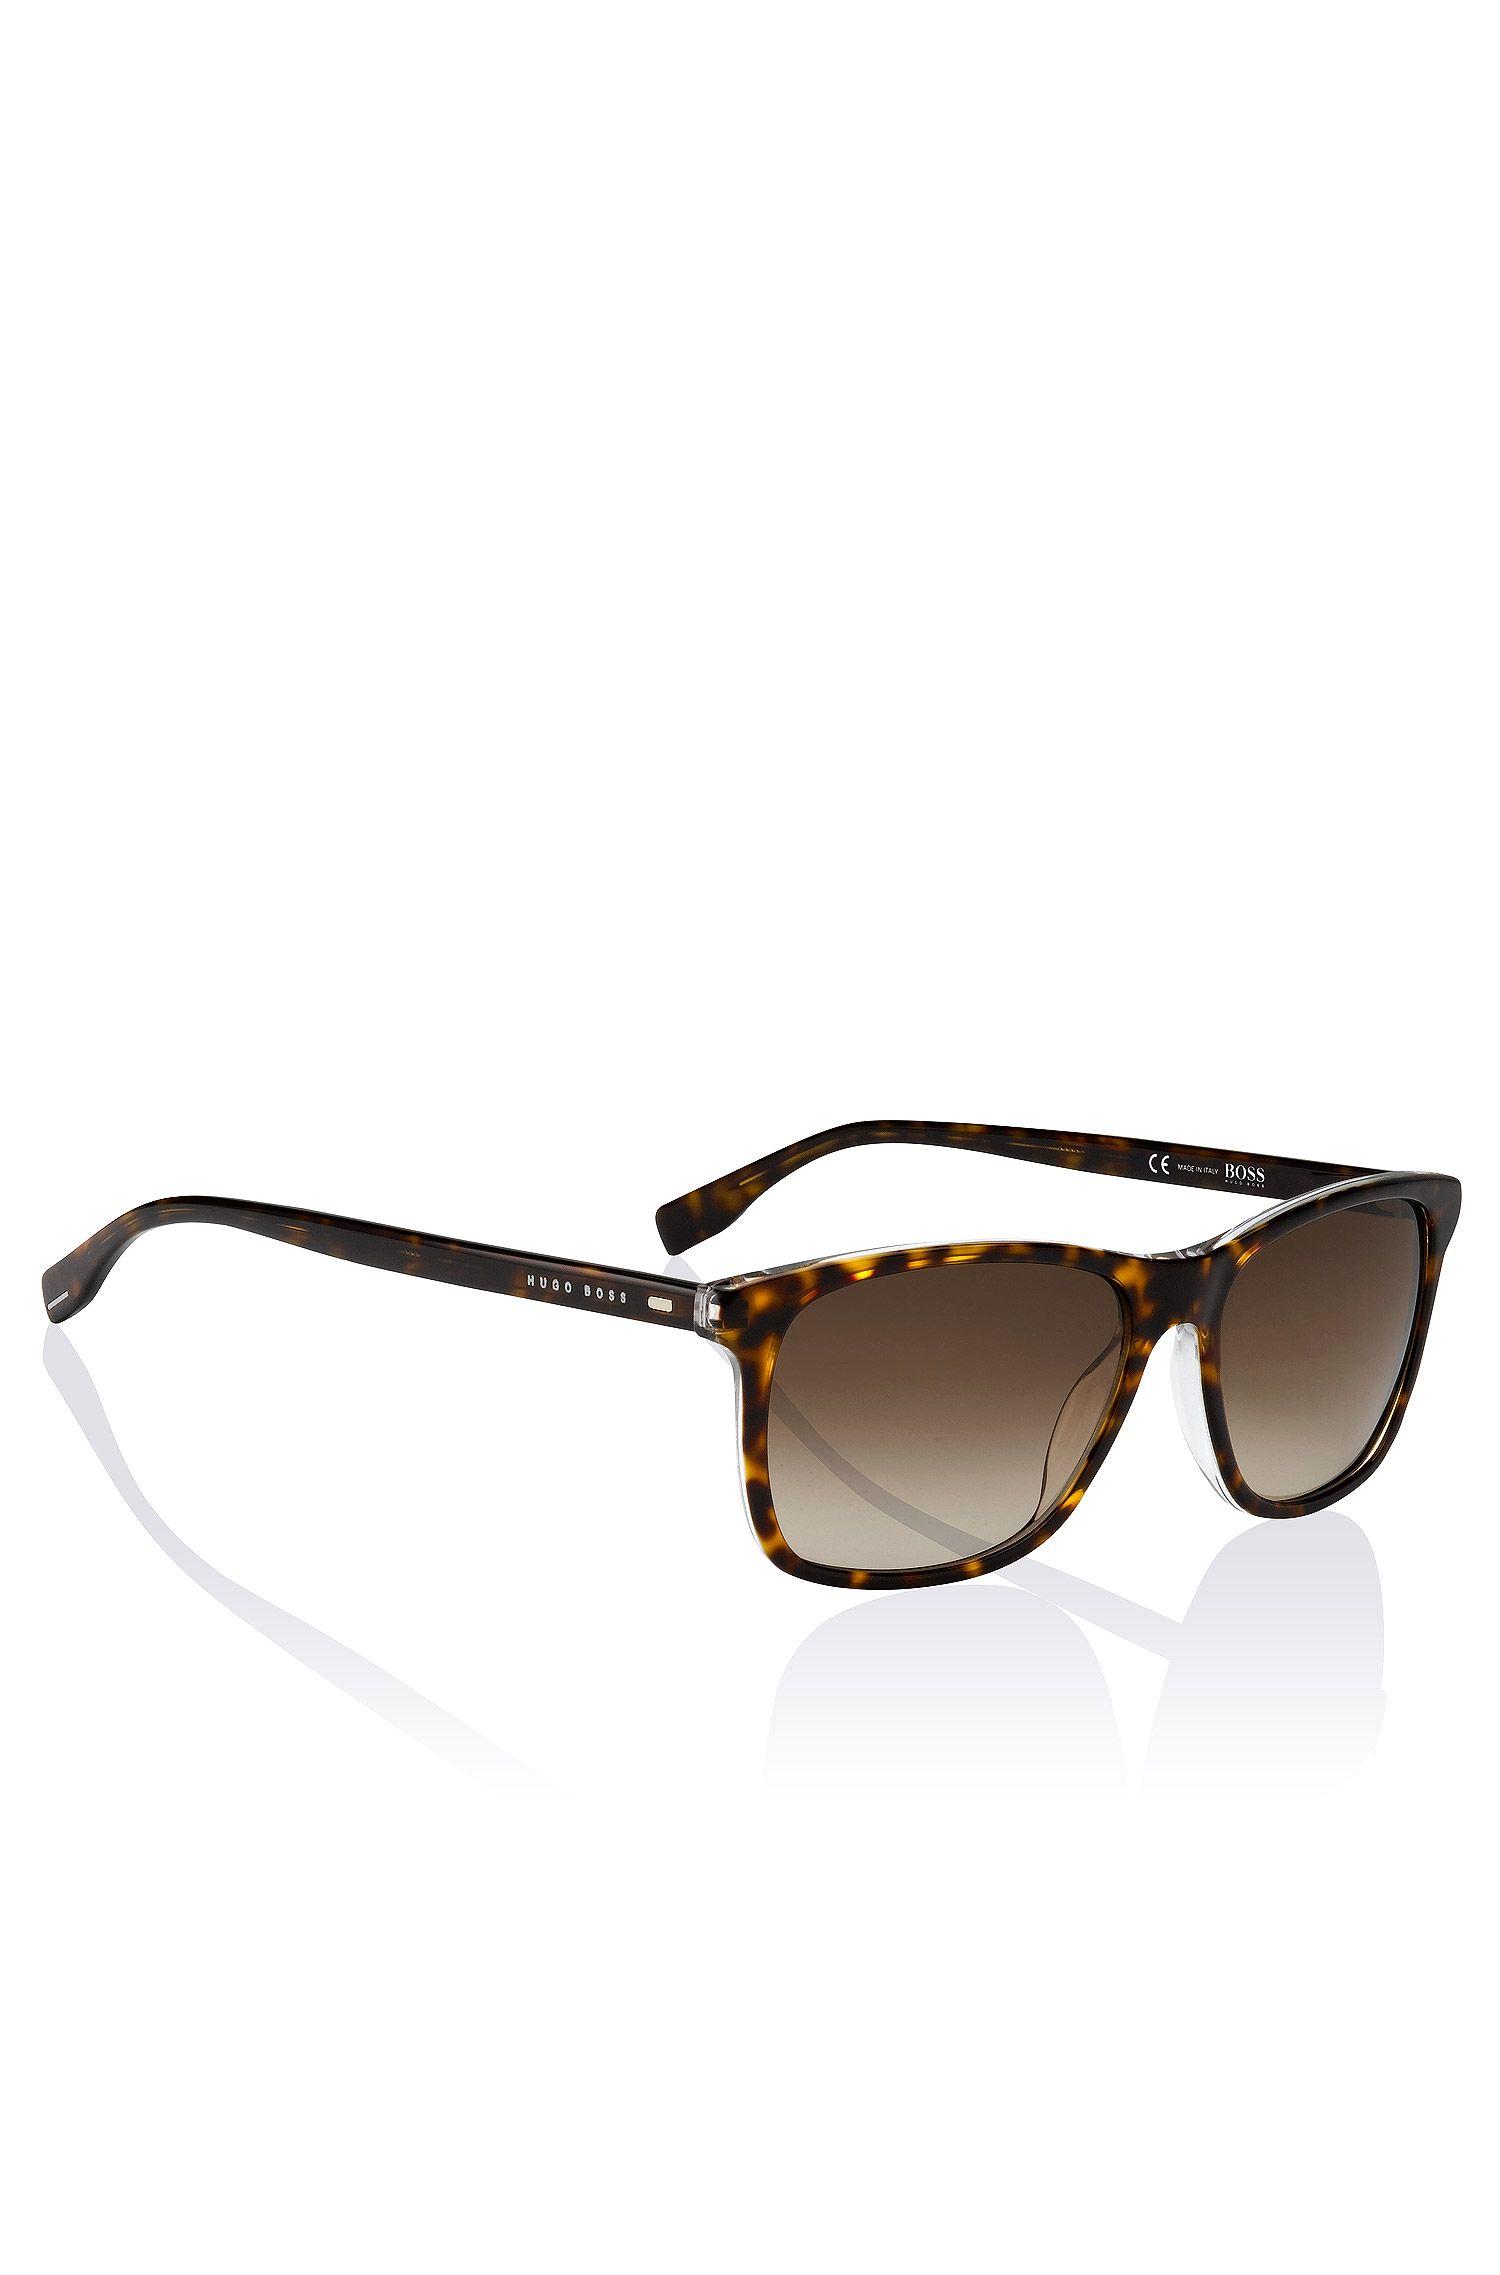 Gafas de sol 'BOSS 0634/S' en acetato